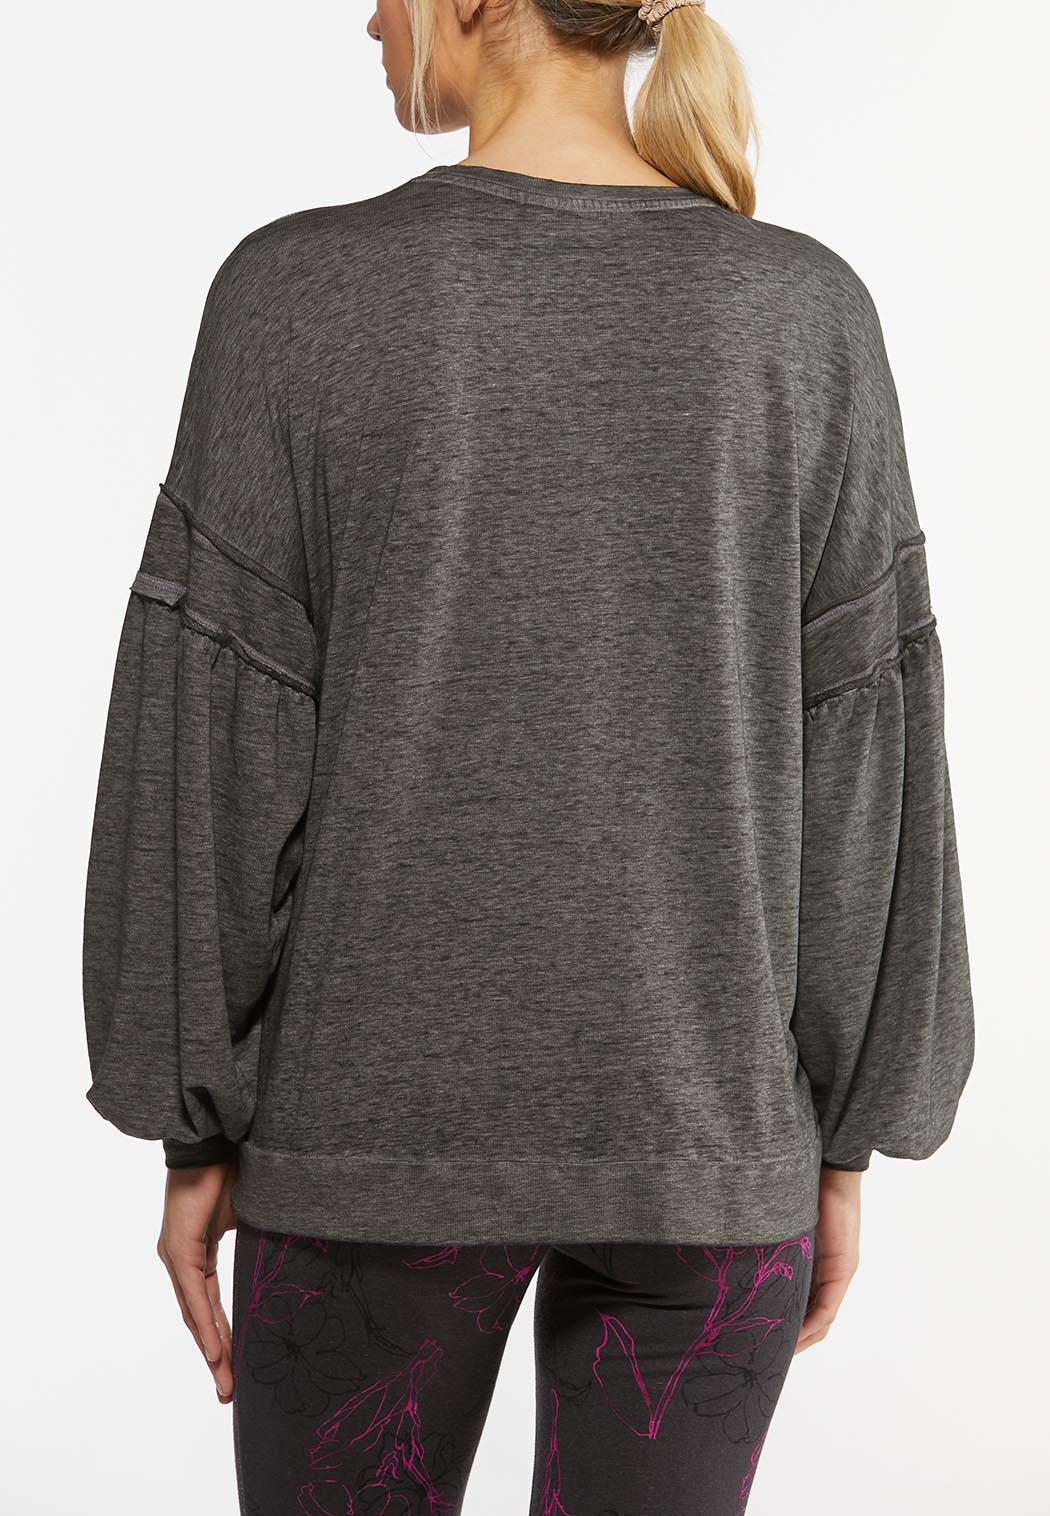 Plus Size Balloon Sleeve Gray Wash Top (Item #44462238)